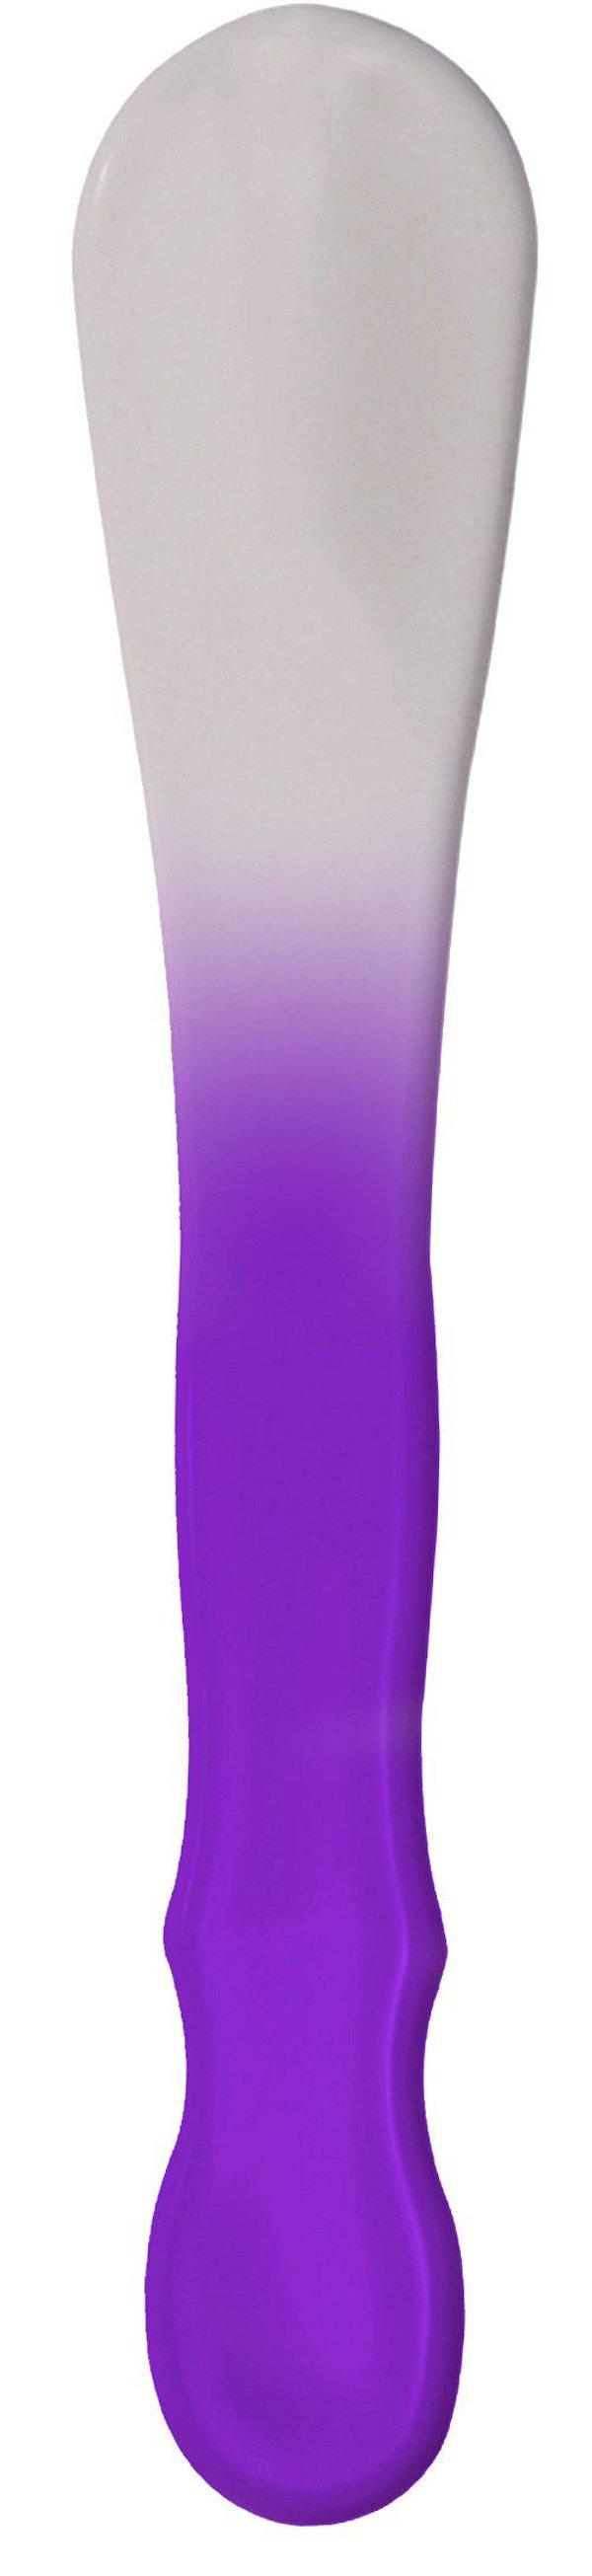 Espátula Plástica para Creme - Luxo - Santa Clara